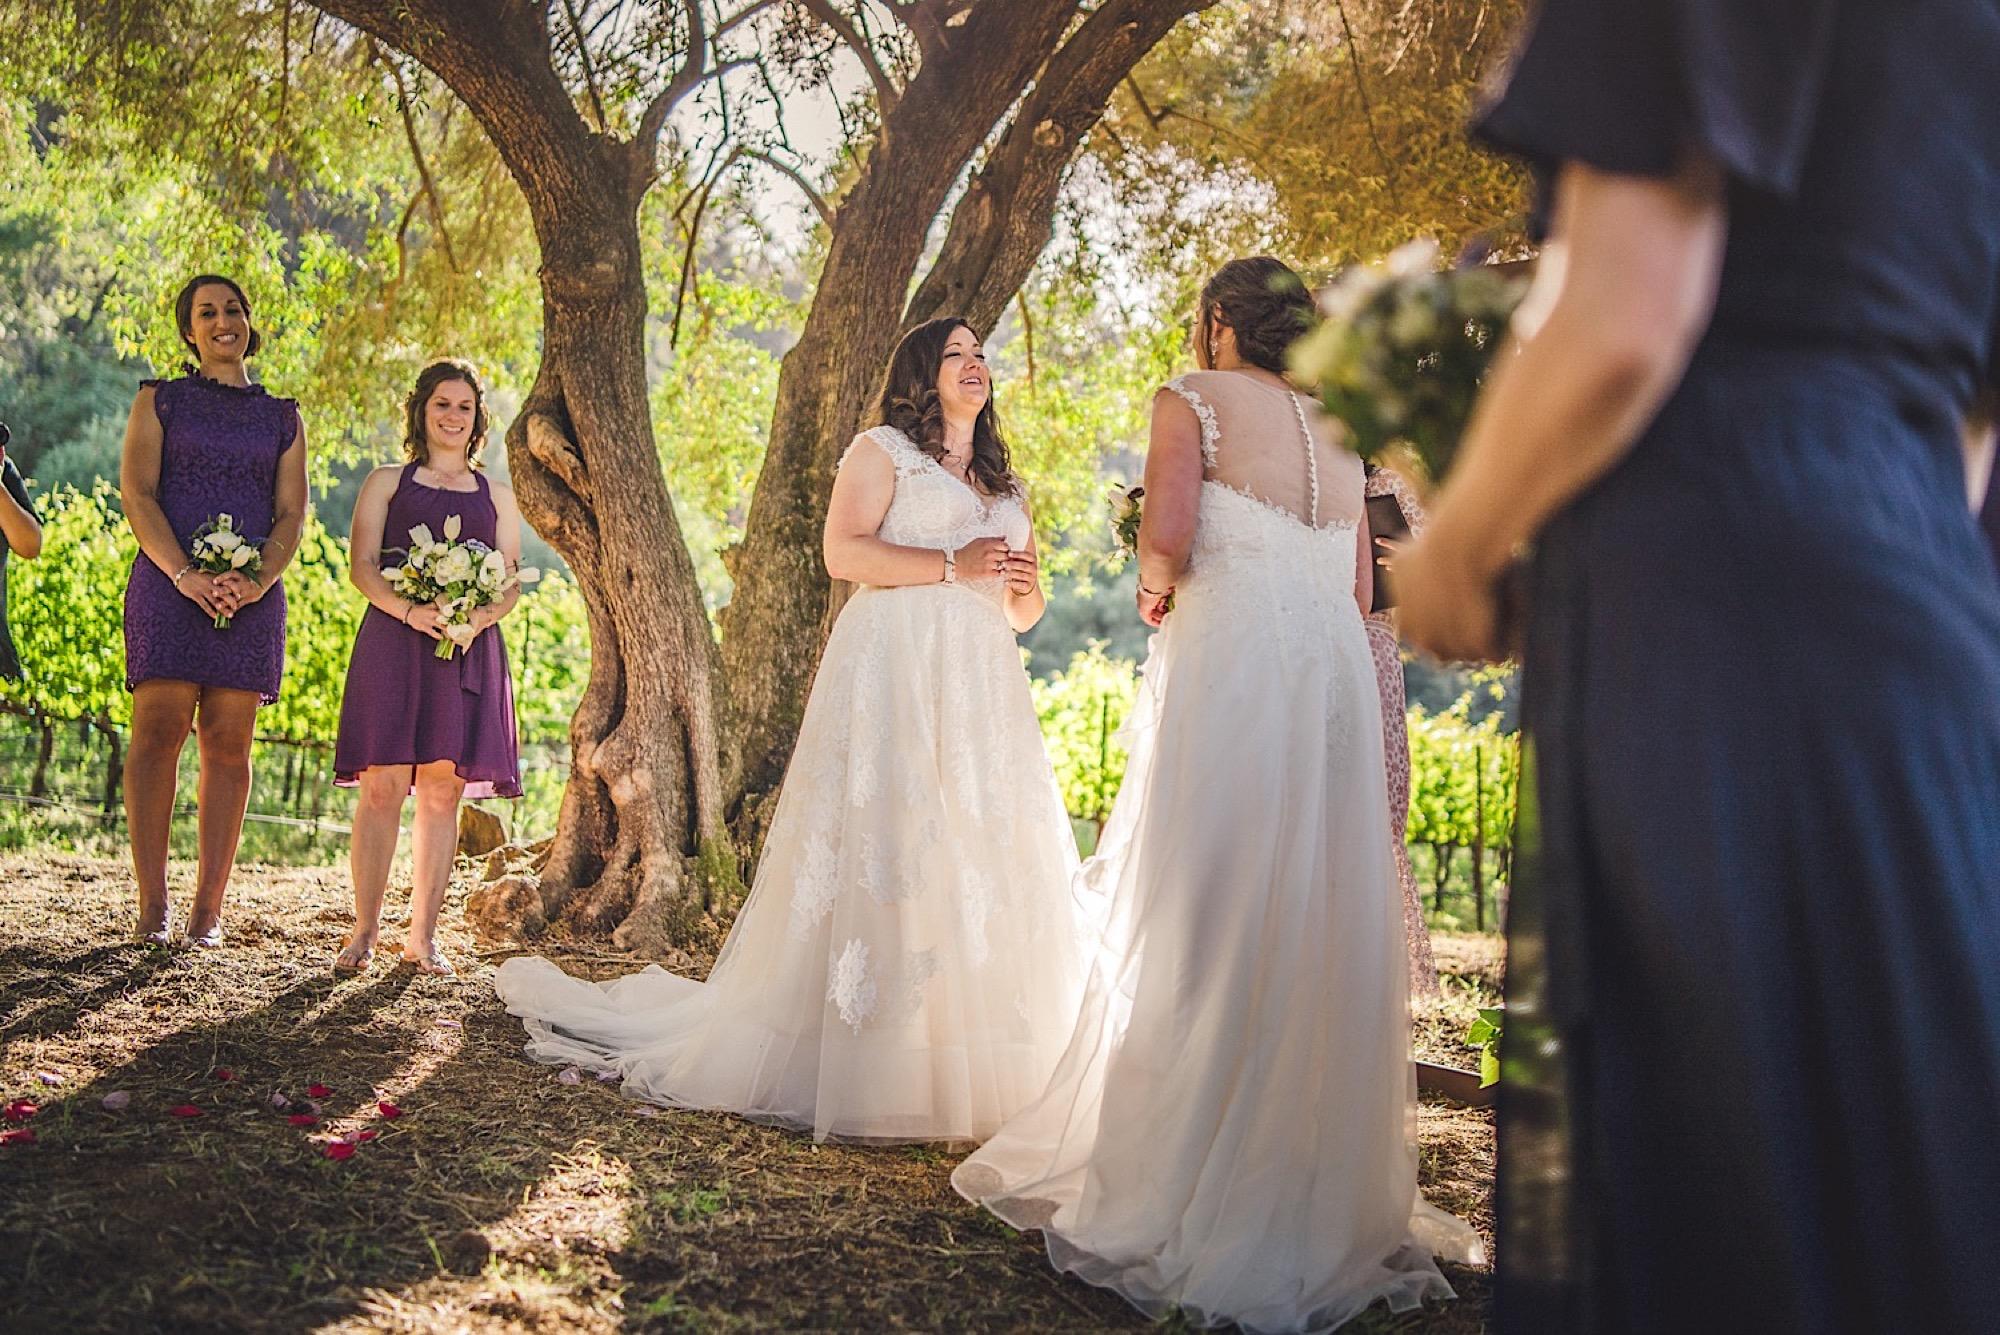 23_gay_Napa_in_wedding.jpg